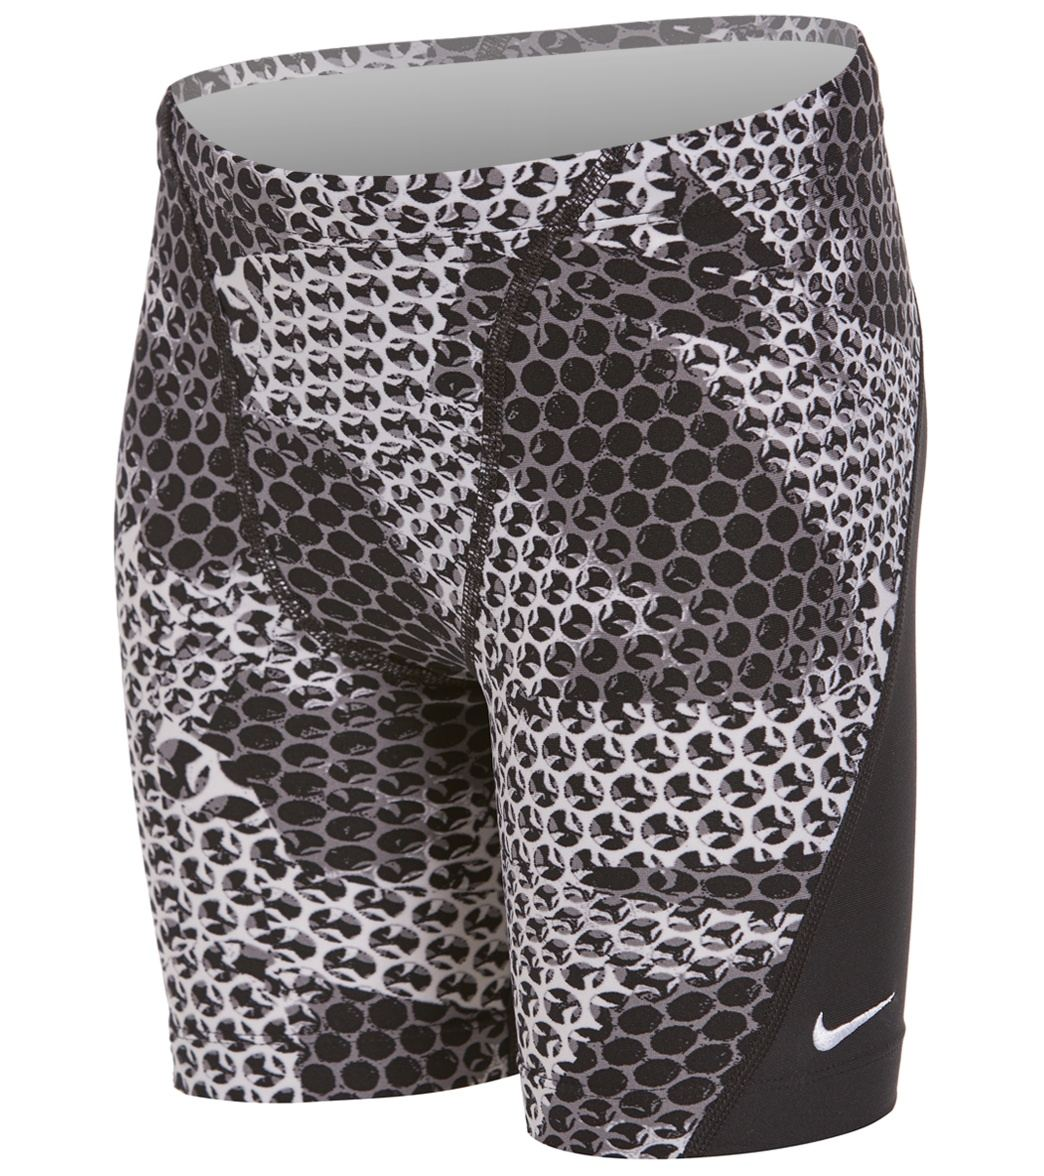 715c48dc54 Nike Boys' Nova Spark Jammer Swimsuit at SwimOutlet.com - Free Shipping